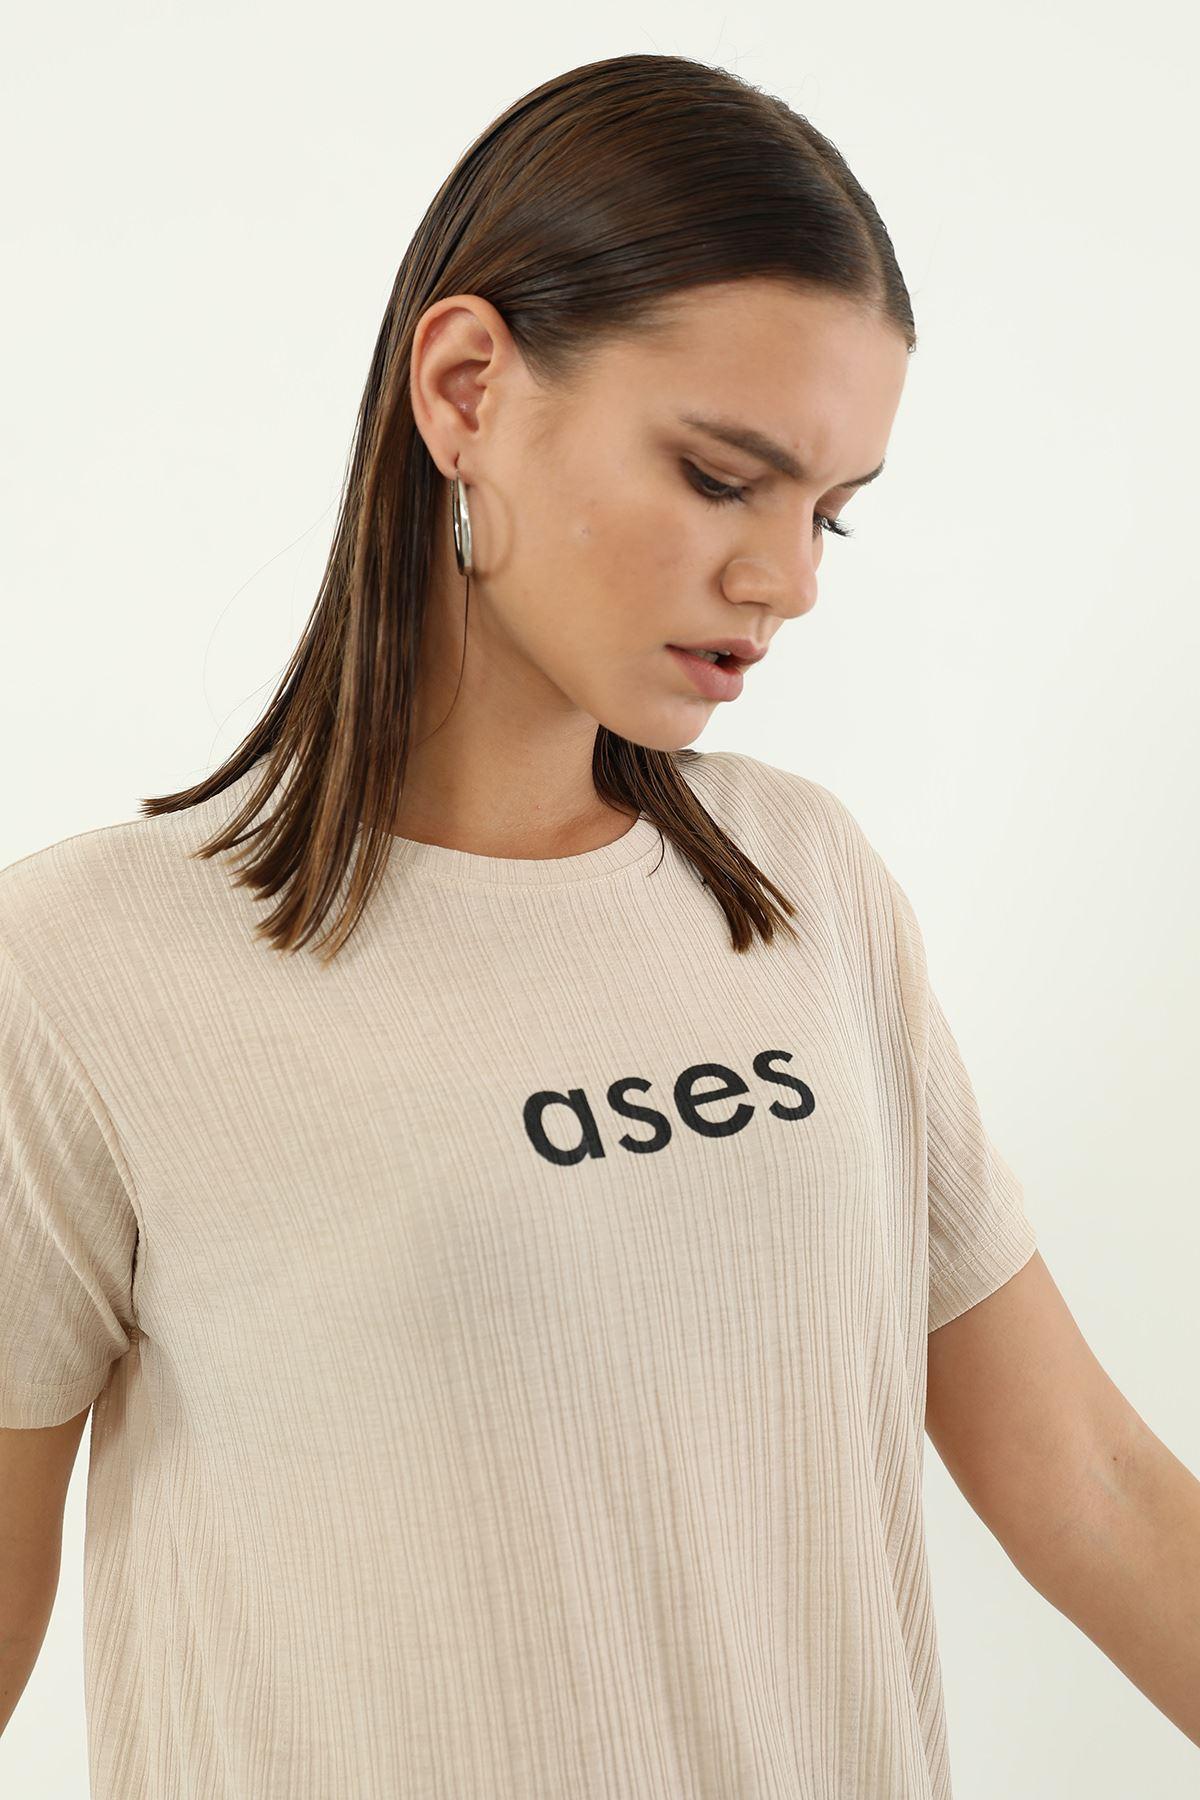 Ases Baskılı T-shirt-Bej